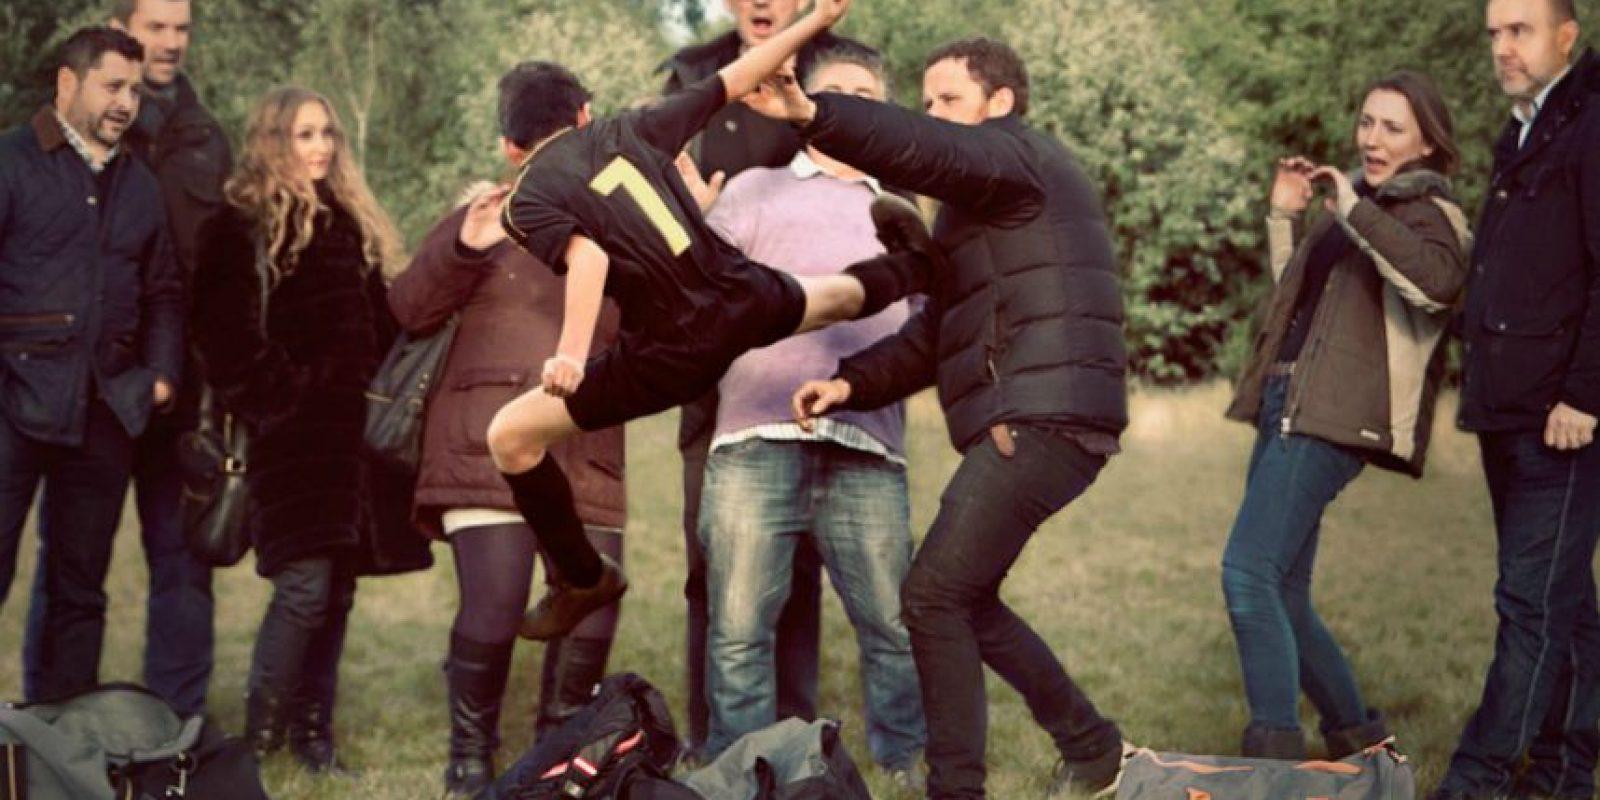 6. Eric Cantona al estilo kung fu. Foto:georgelogan.co.uk